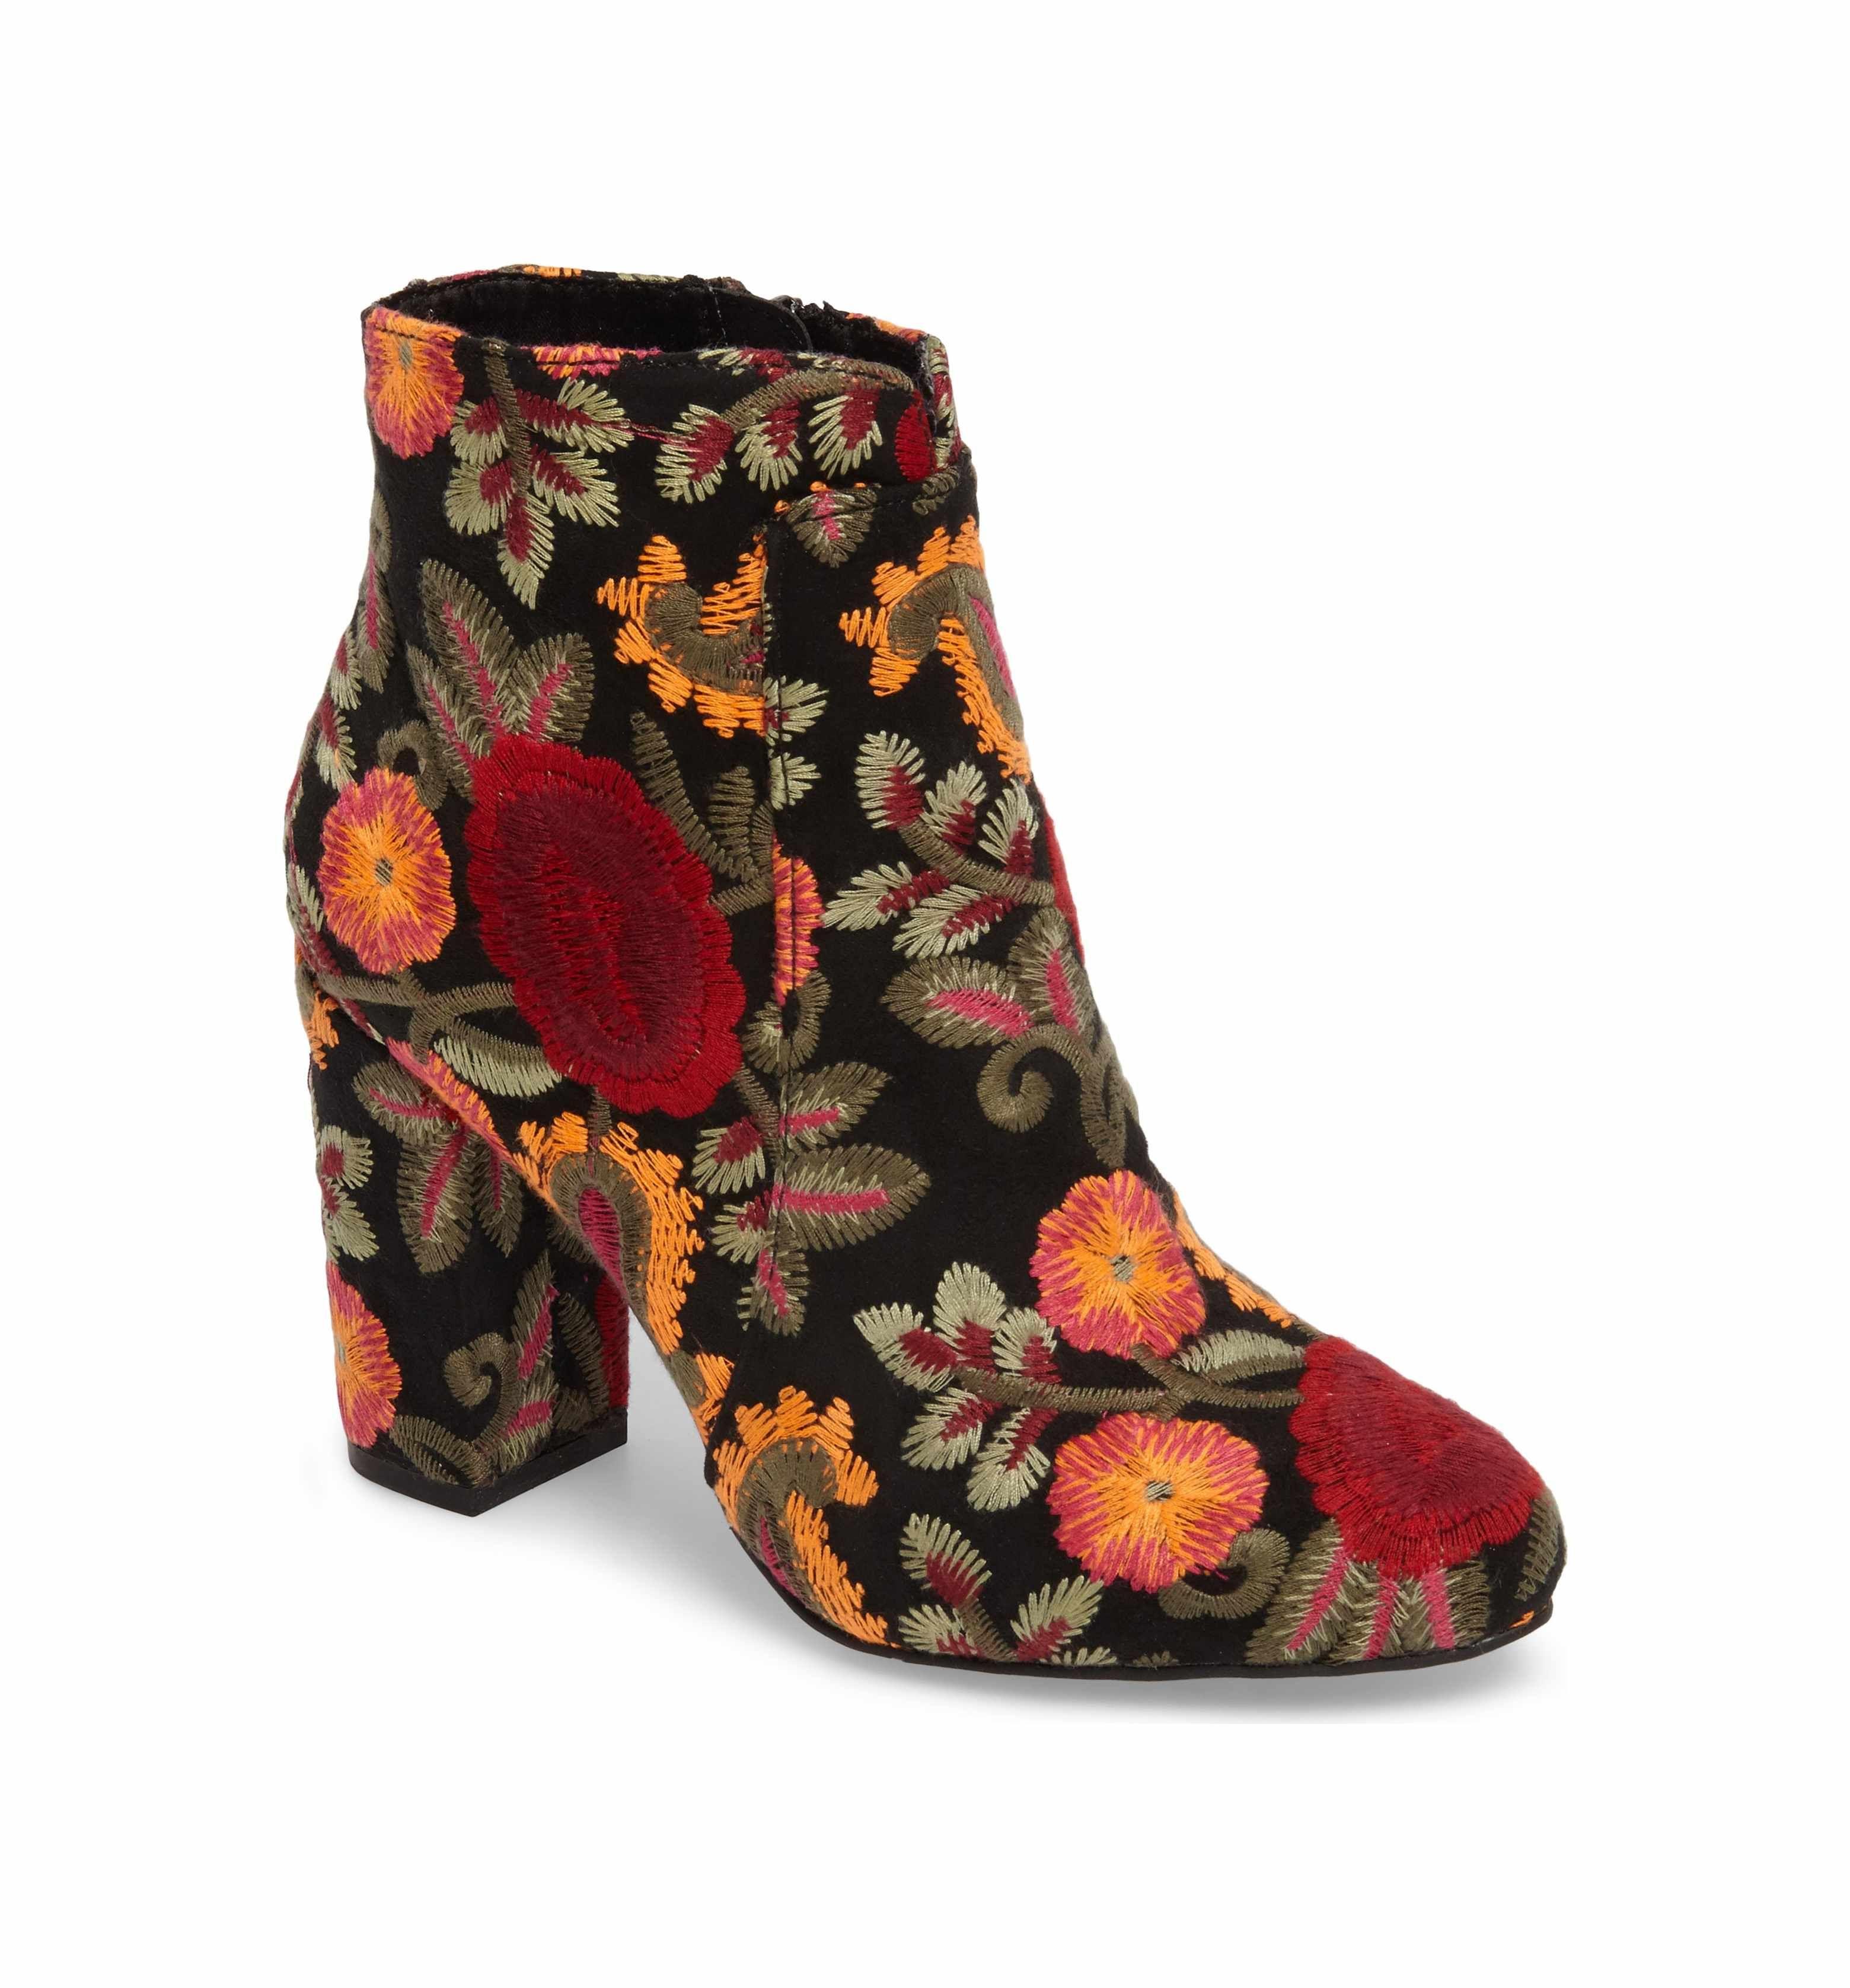 Stylish fall boots, Boots, Mia boots